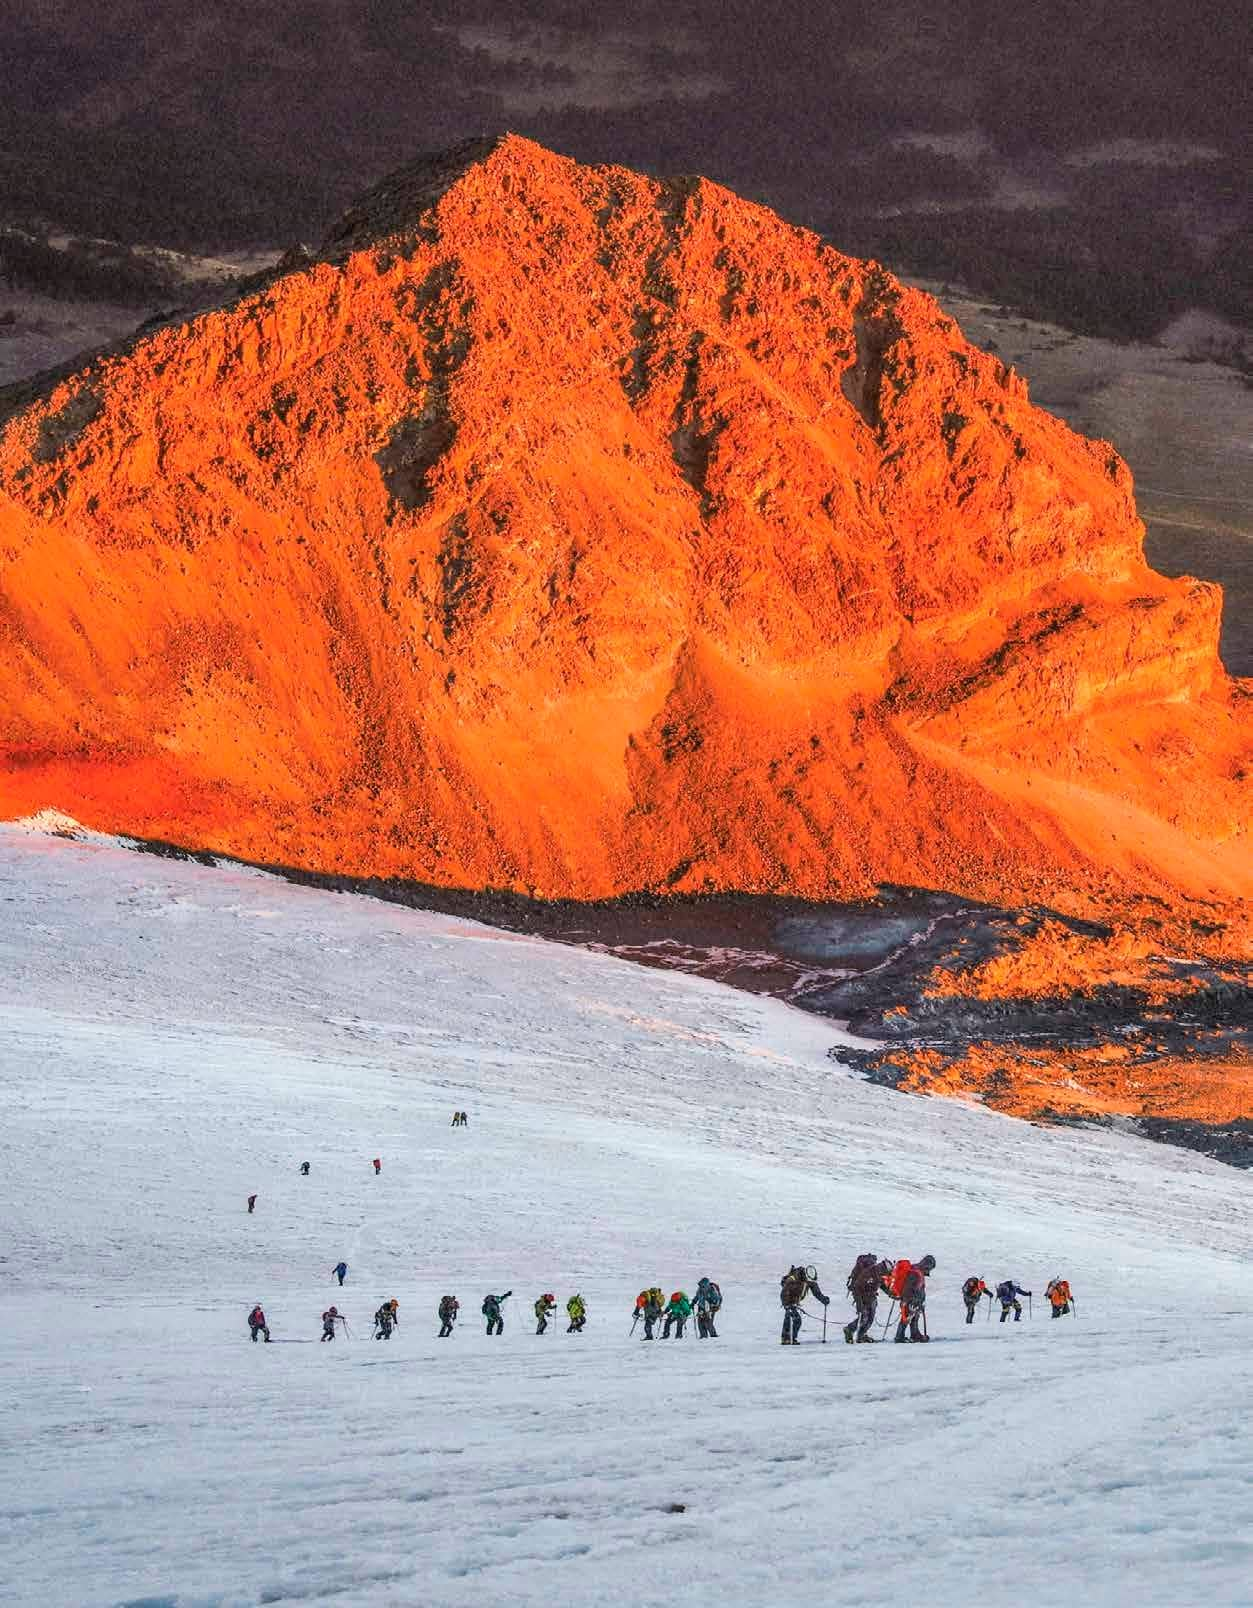 El turismo vuelve a la naturaleza